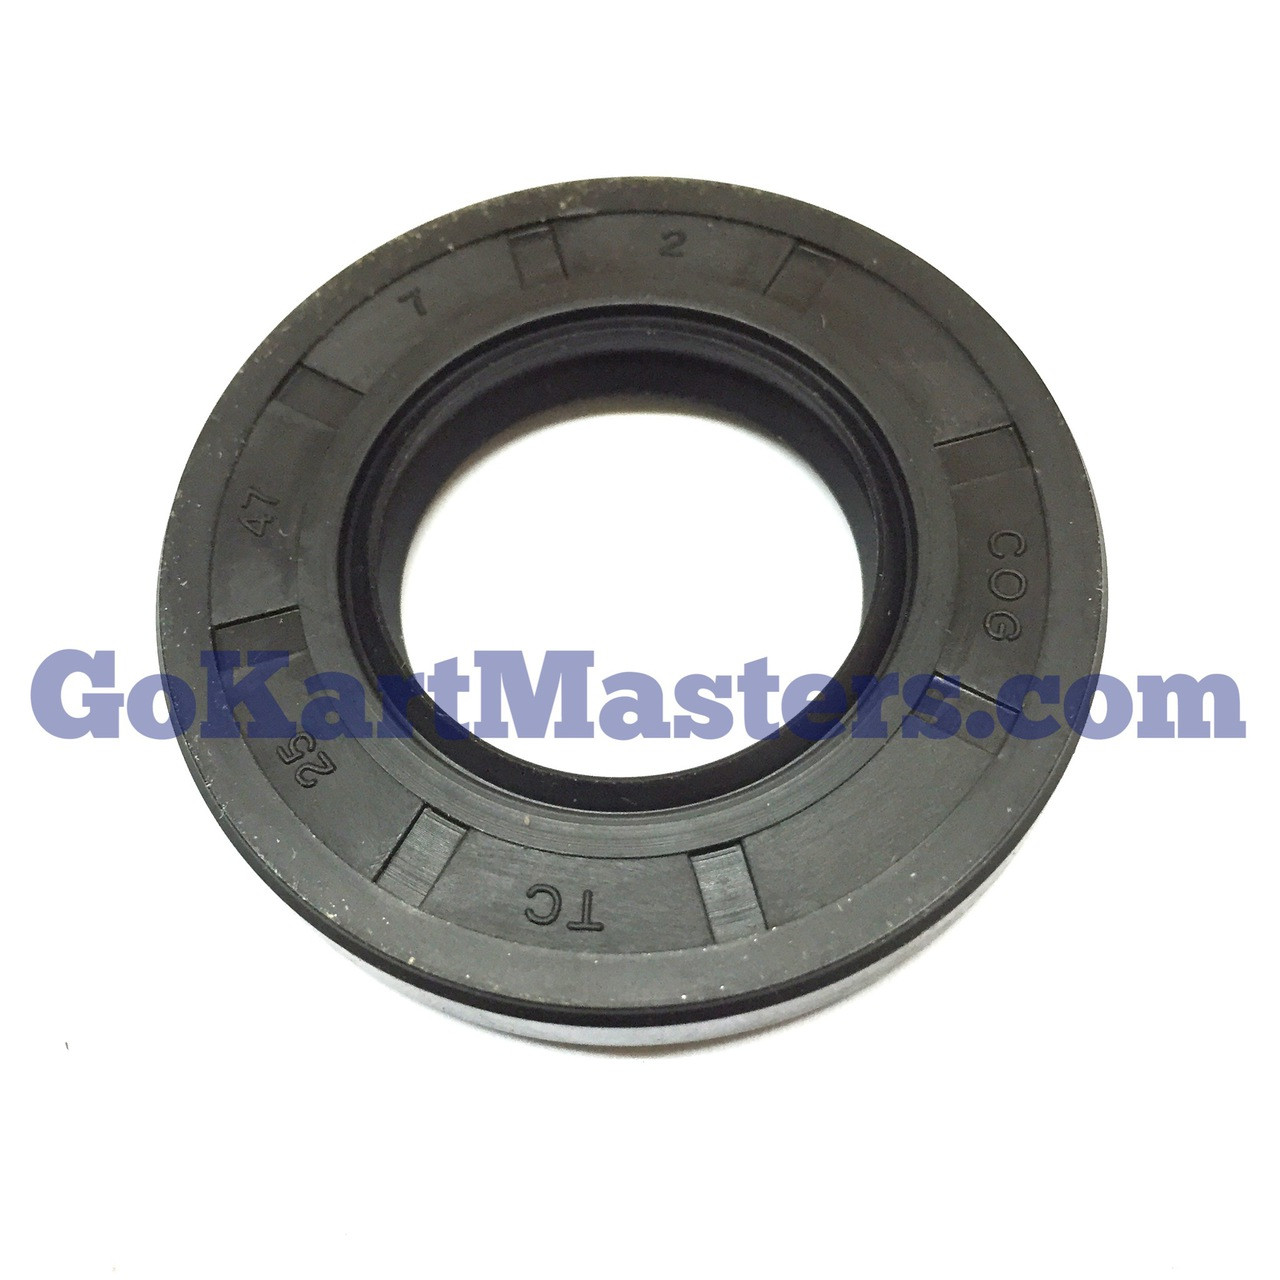 TrailMaster 150 XRS & 150 XRX Front Wheel Seal